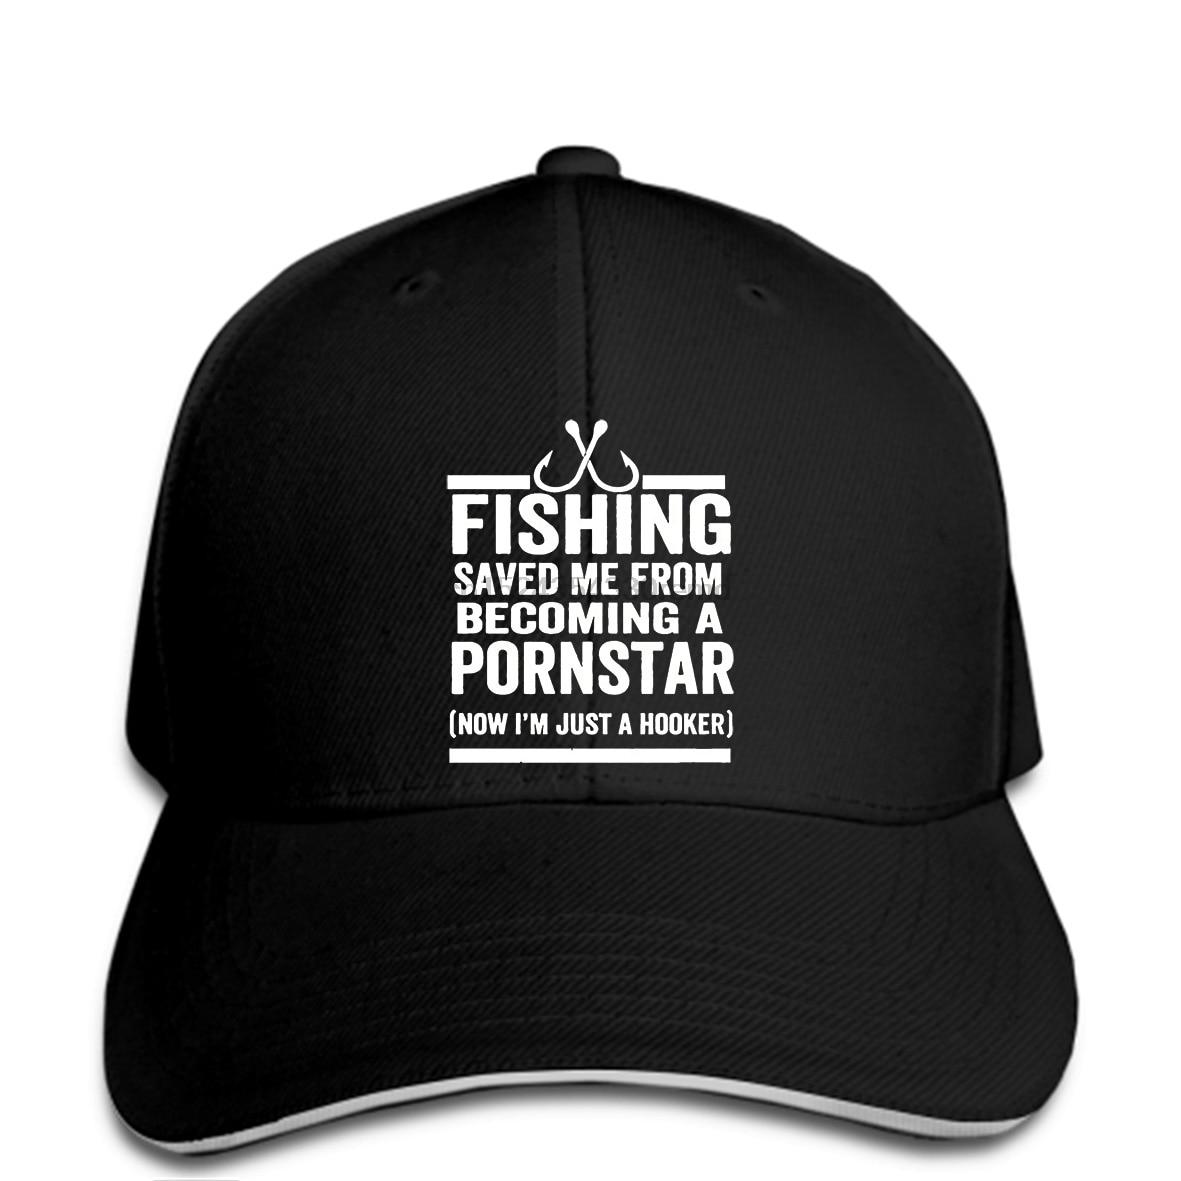 7b30187365757 Buy caps fishing men and get free shipping on AliExpress.com